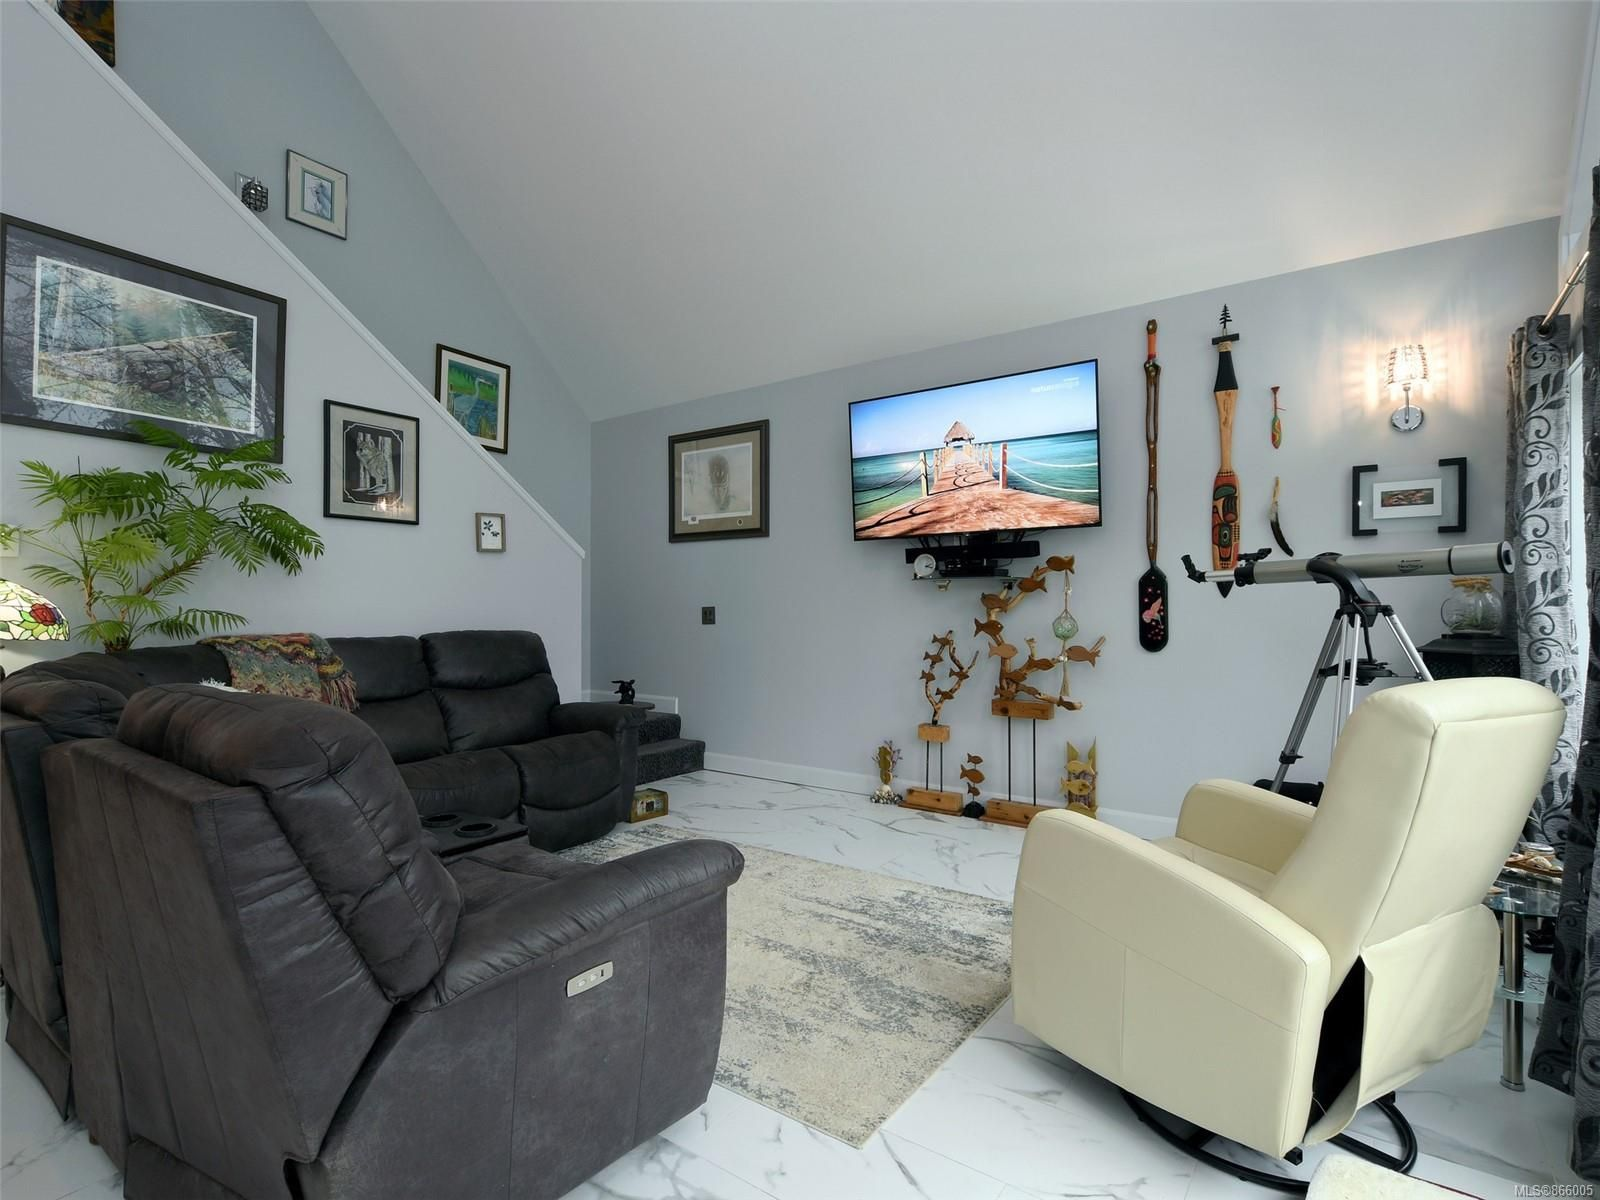 Photo 4: Photos: 5739 Siasong Rd in : Sk Saseenos House for sale (Sooke)  : MLS®# 866005